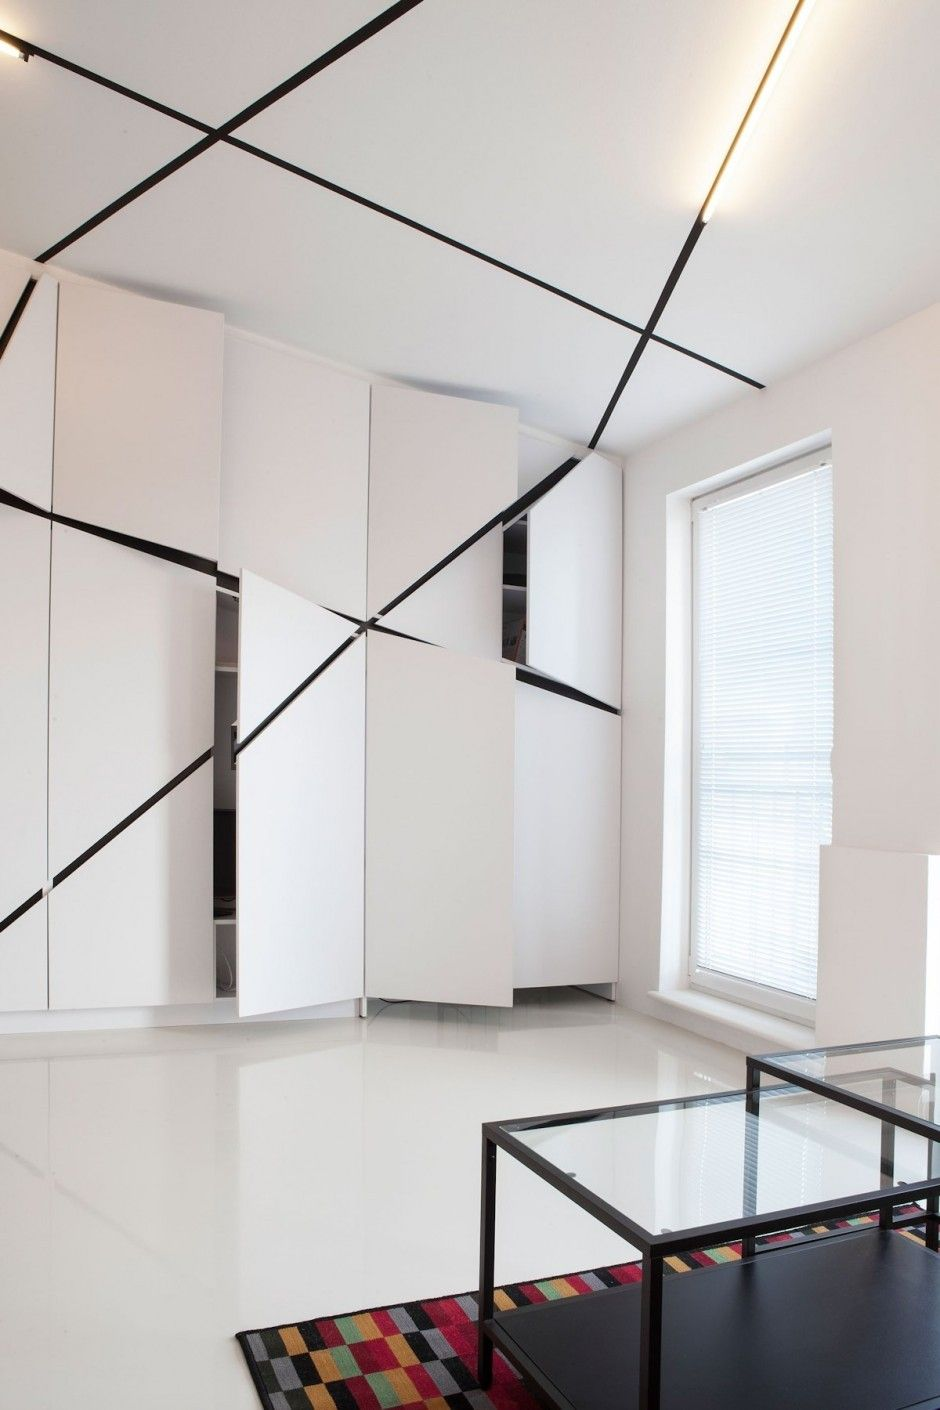 peter 39 s flat par mili mlodzi ludzie interieurs pinterest. Black Bedroom Furniture Sets. Home Design Ideas